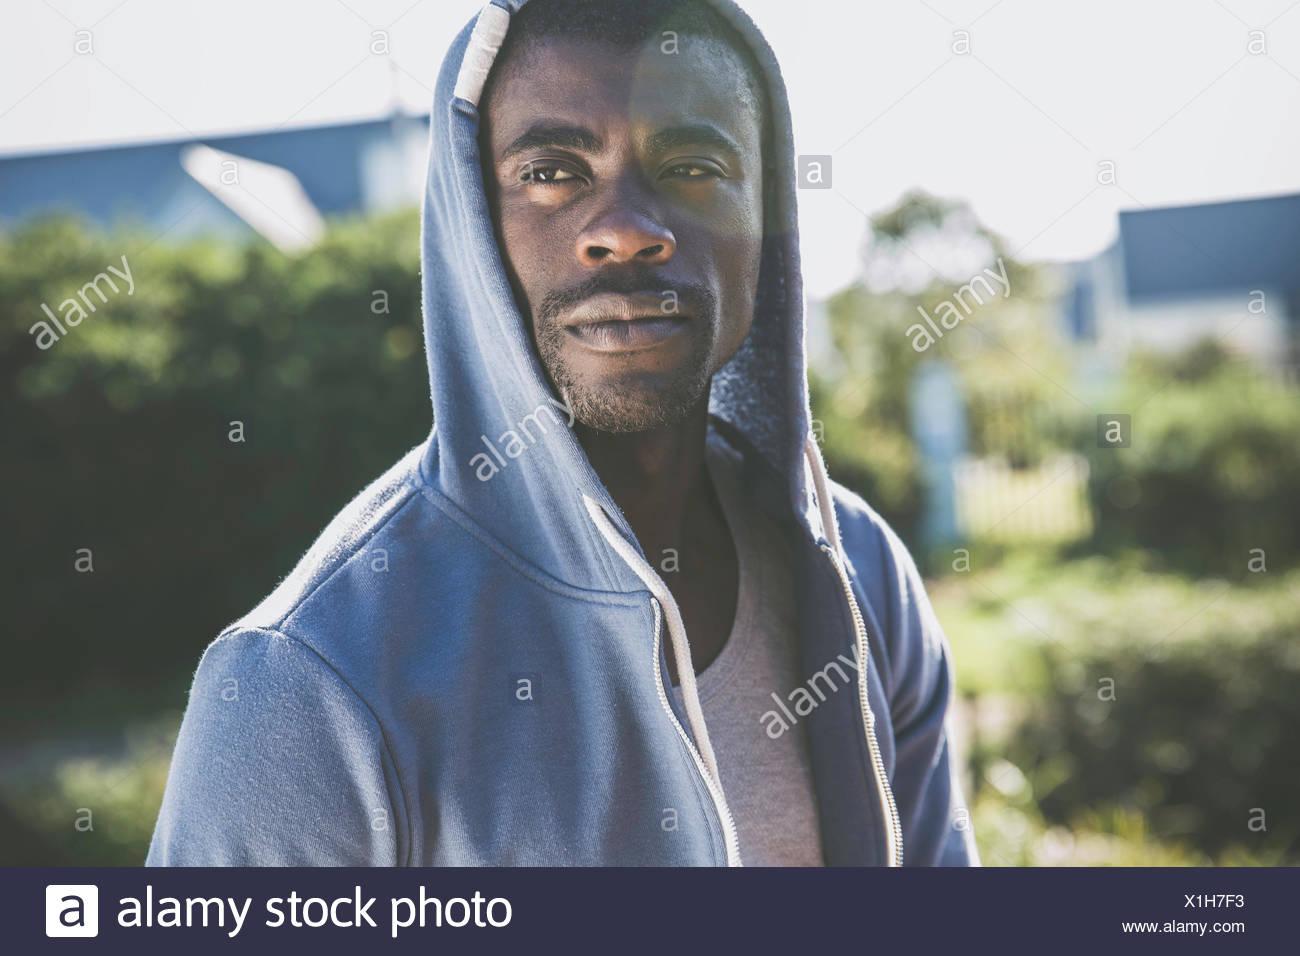 Portrait of man wearing hooded top looking away Photo Stock